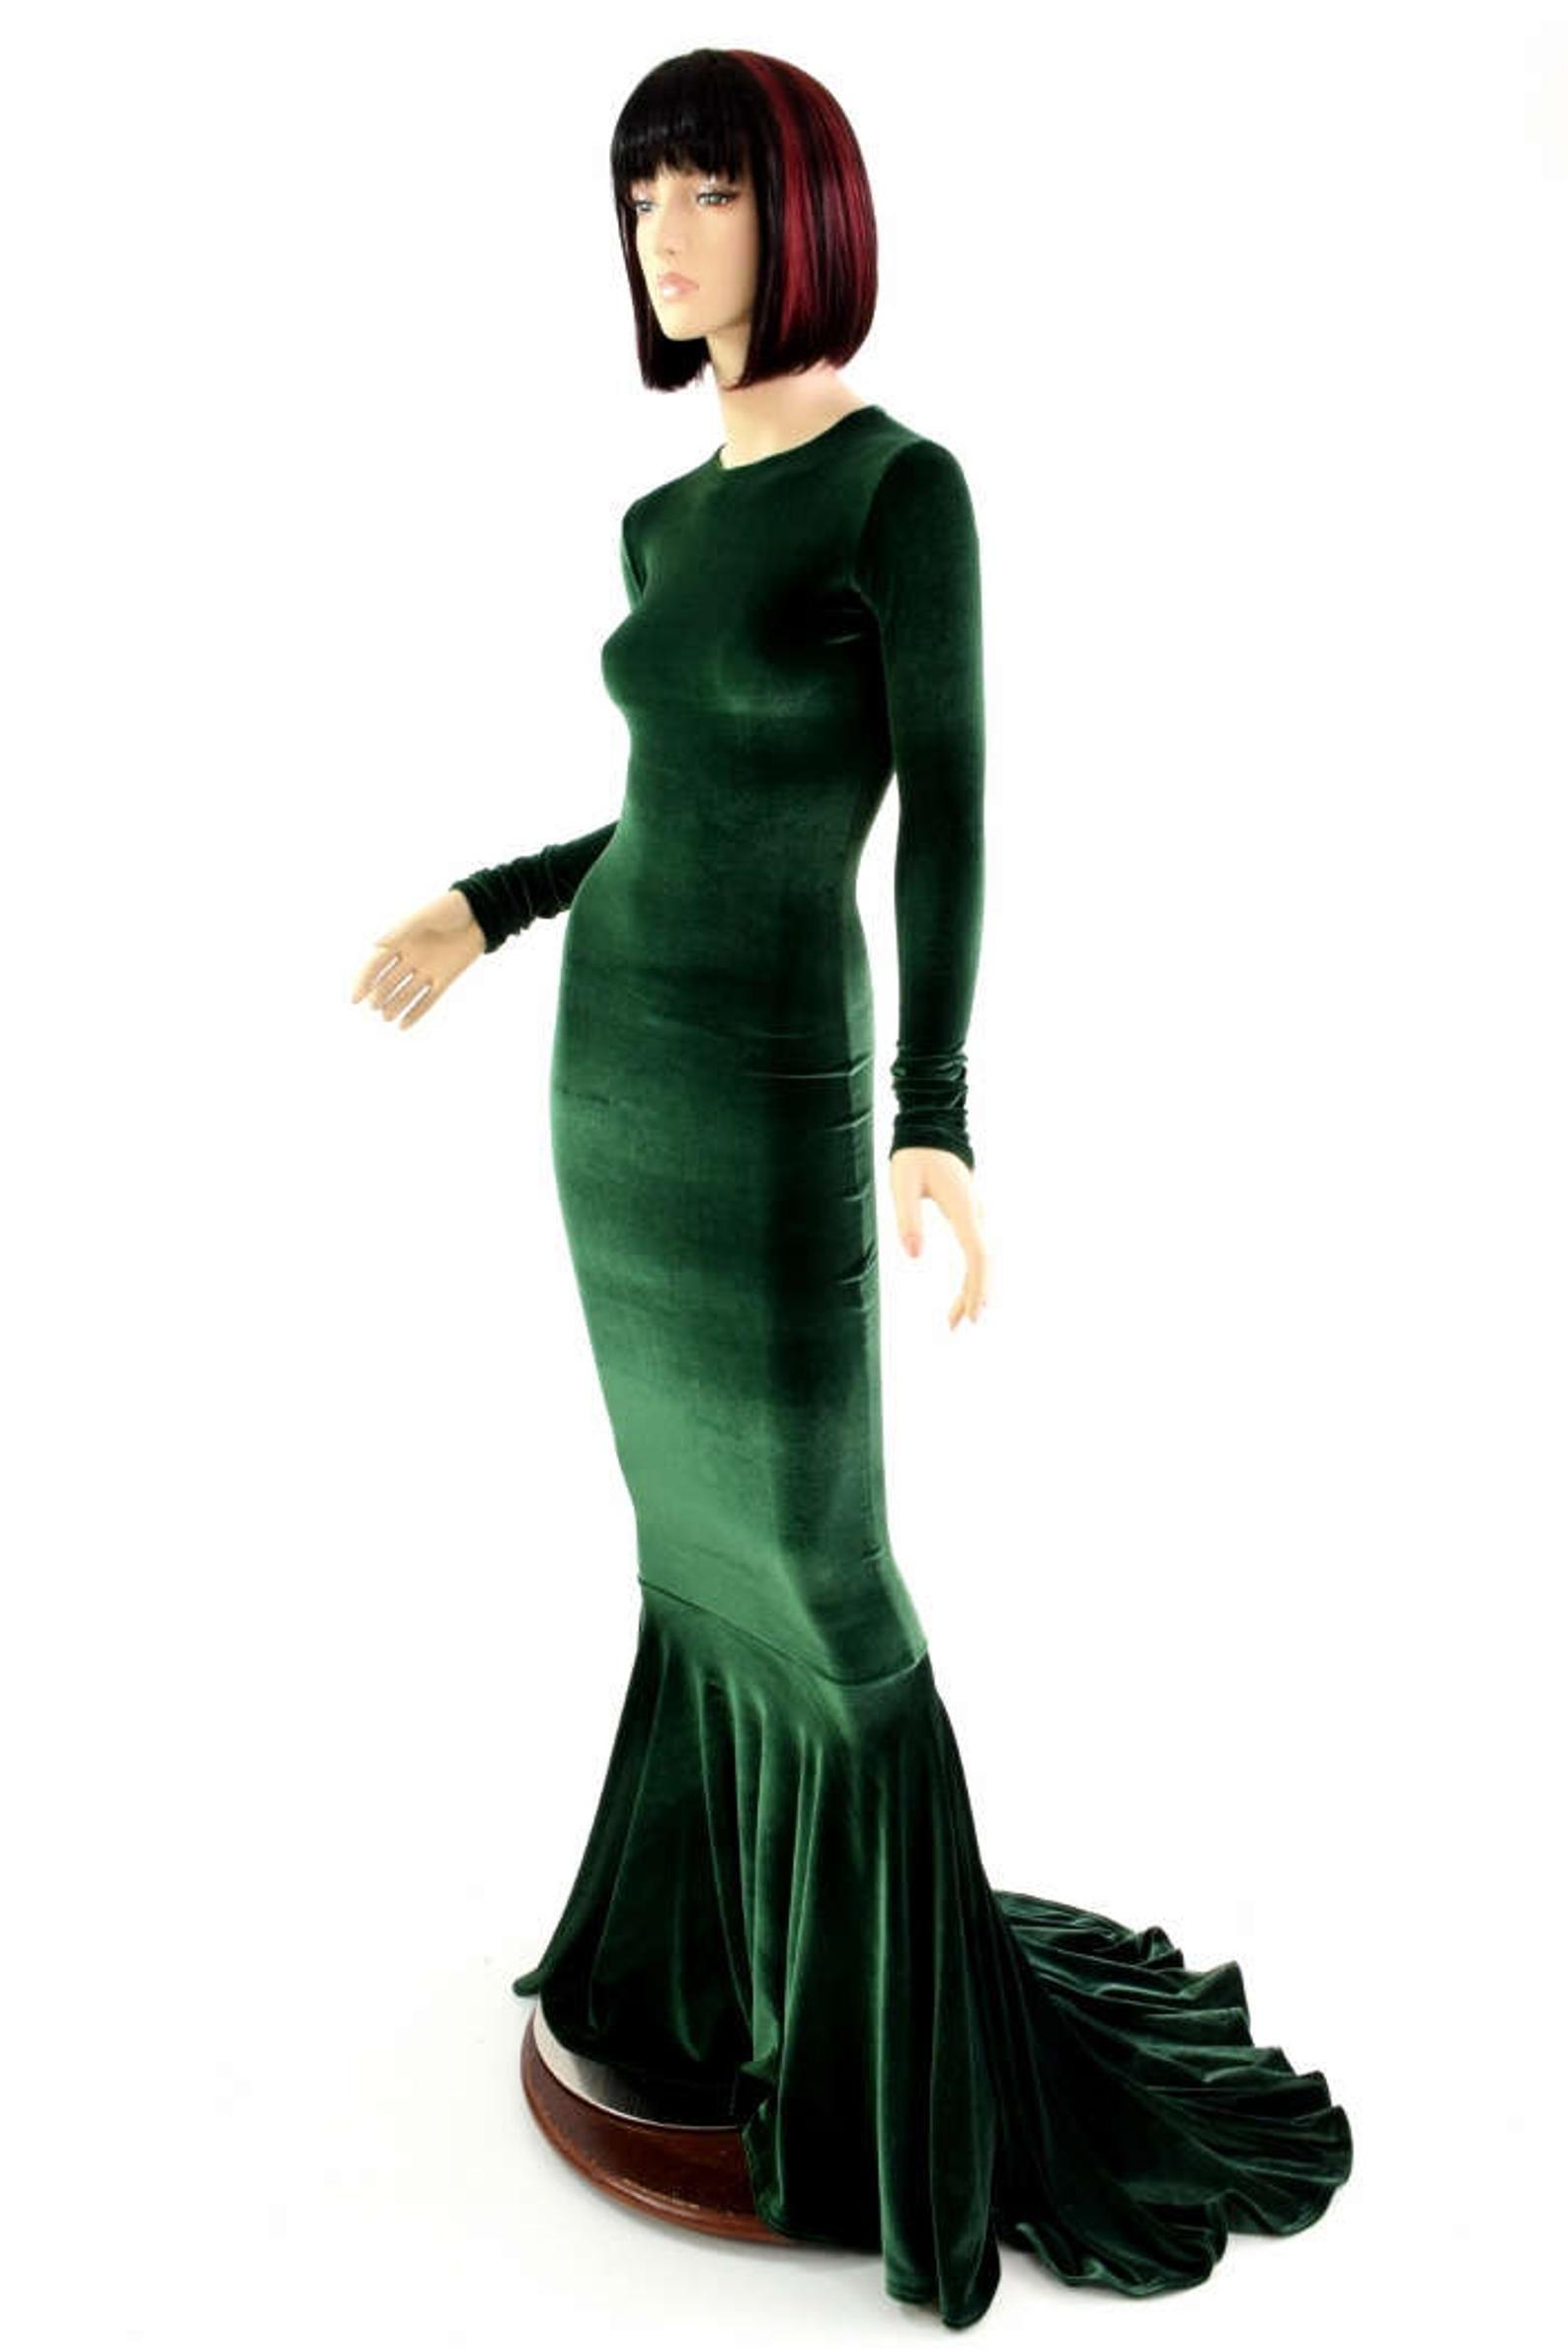 Bewitching Long Forest Green Velvet Gown With Crew Neckline Etsy Long Sleeve Gown Velvet Gown Green Velvet Dress [ 2382 x 1588 Pixel ]